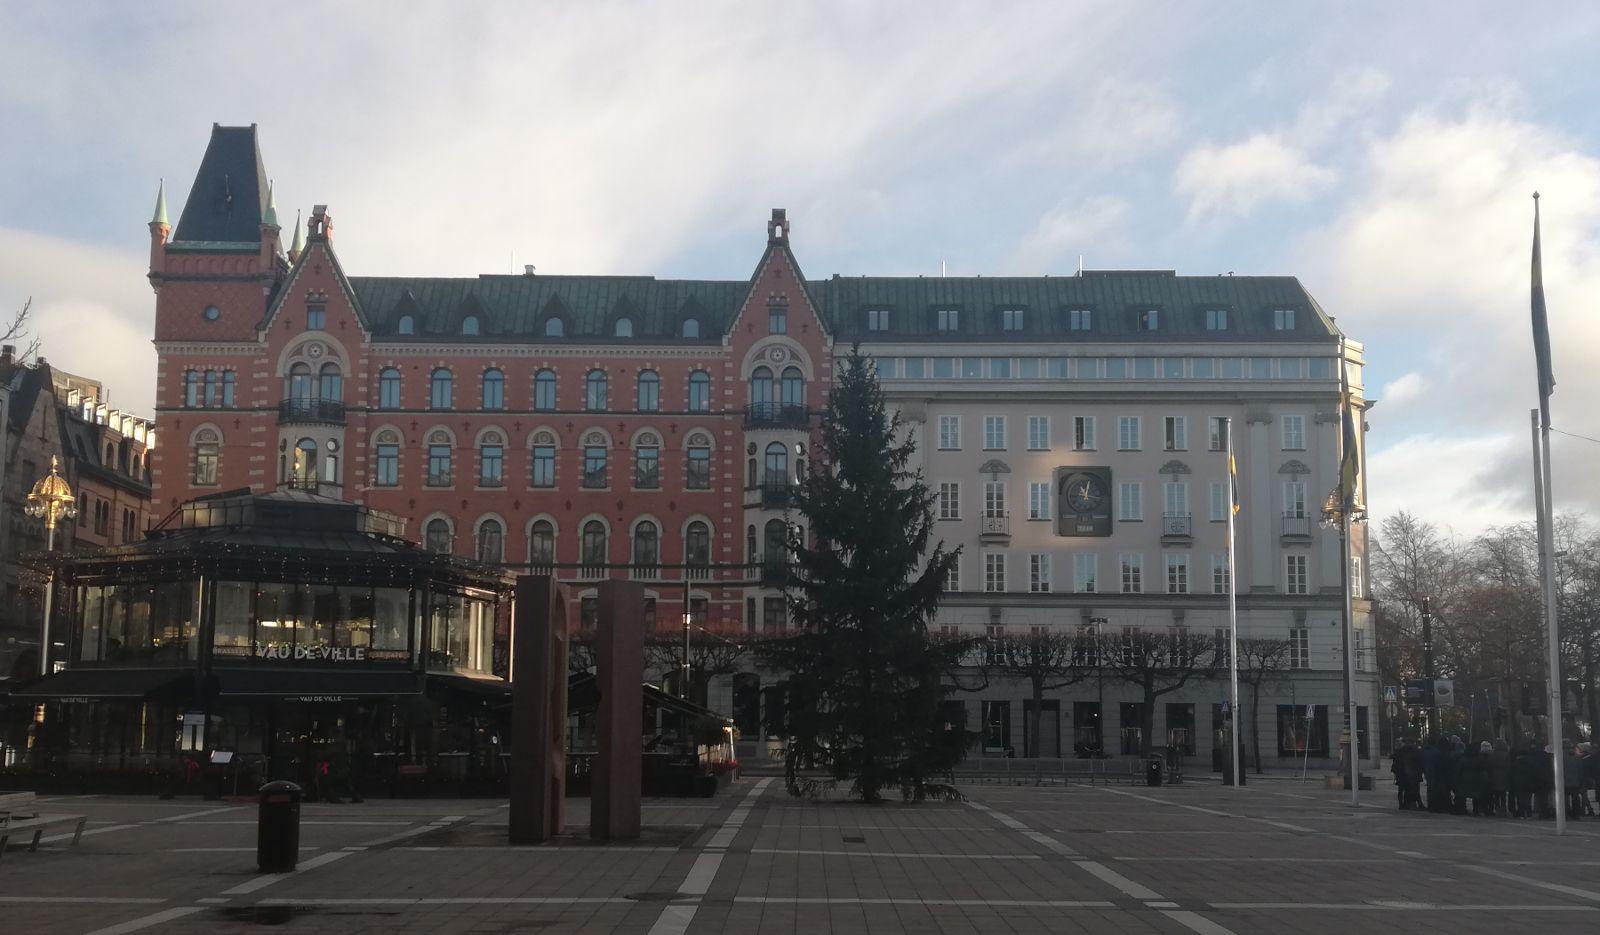 kontorshotell Stockholm city